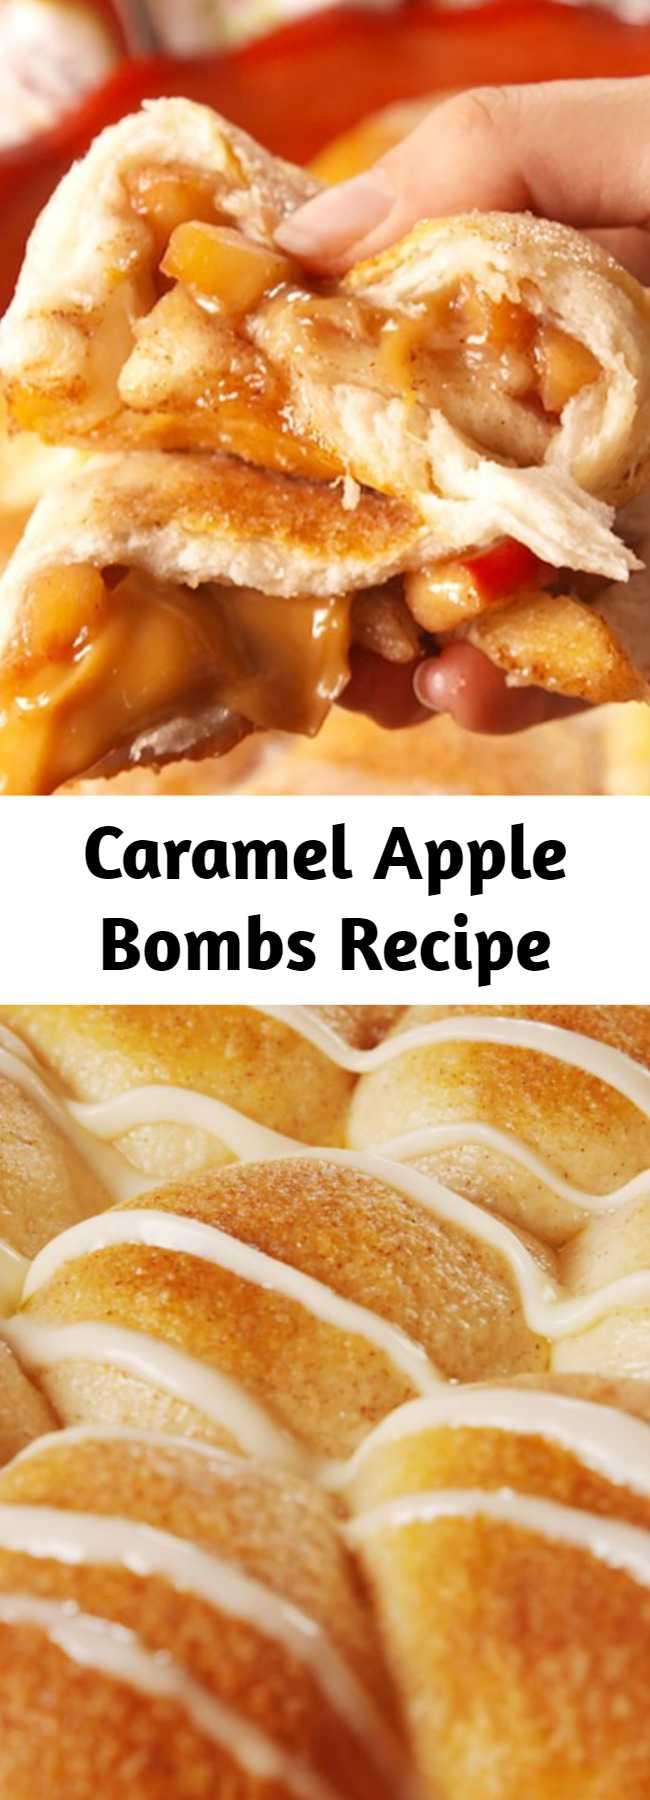 Caramel Apple Bombs Recipe - The best way to get your caramel apple fix. #easy #recipe #caramel #apple #fall #homemade #dessert #stuffed #fallrecipe #food #easyrecipe #apples